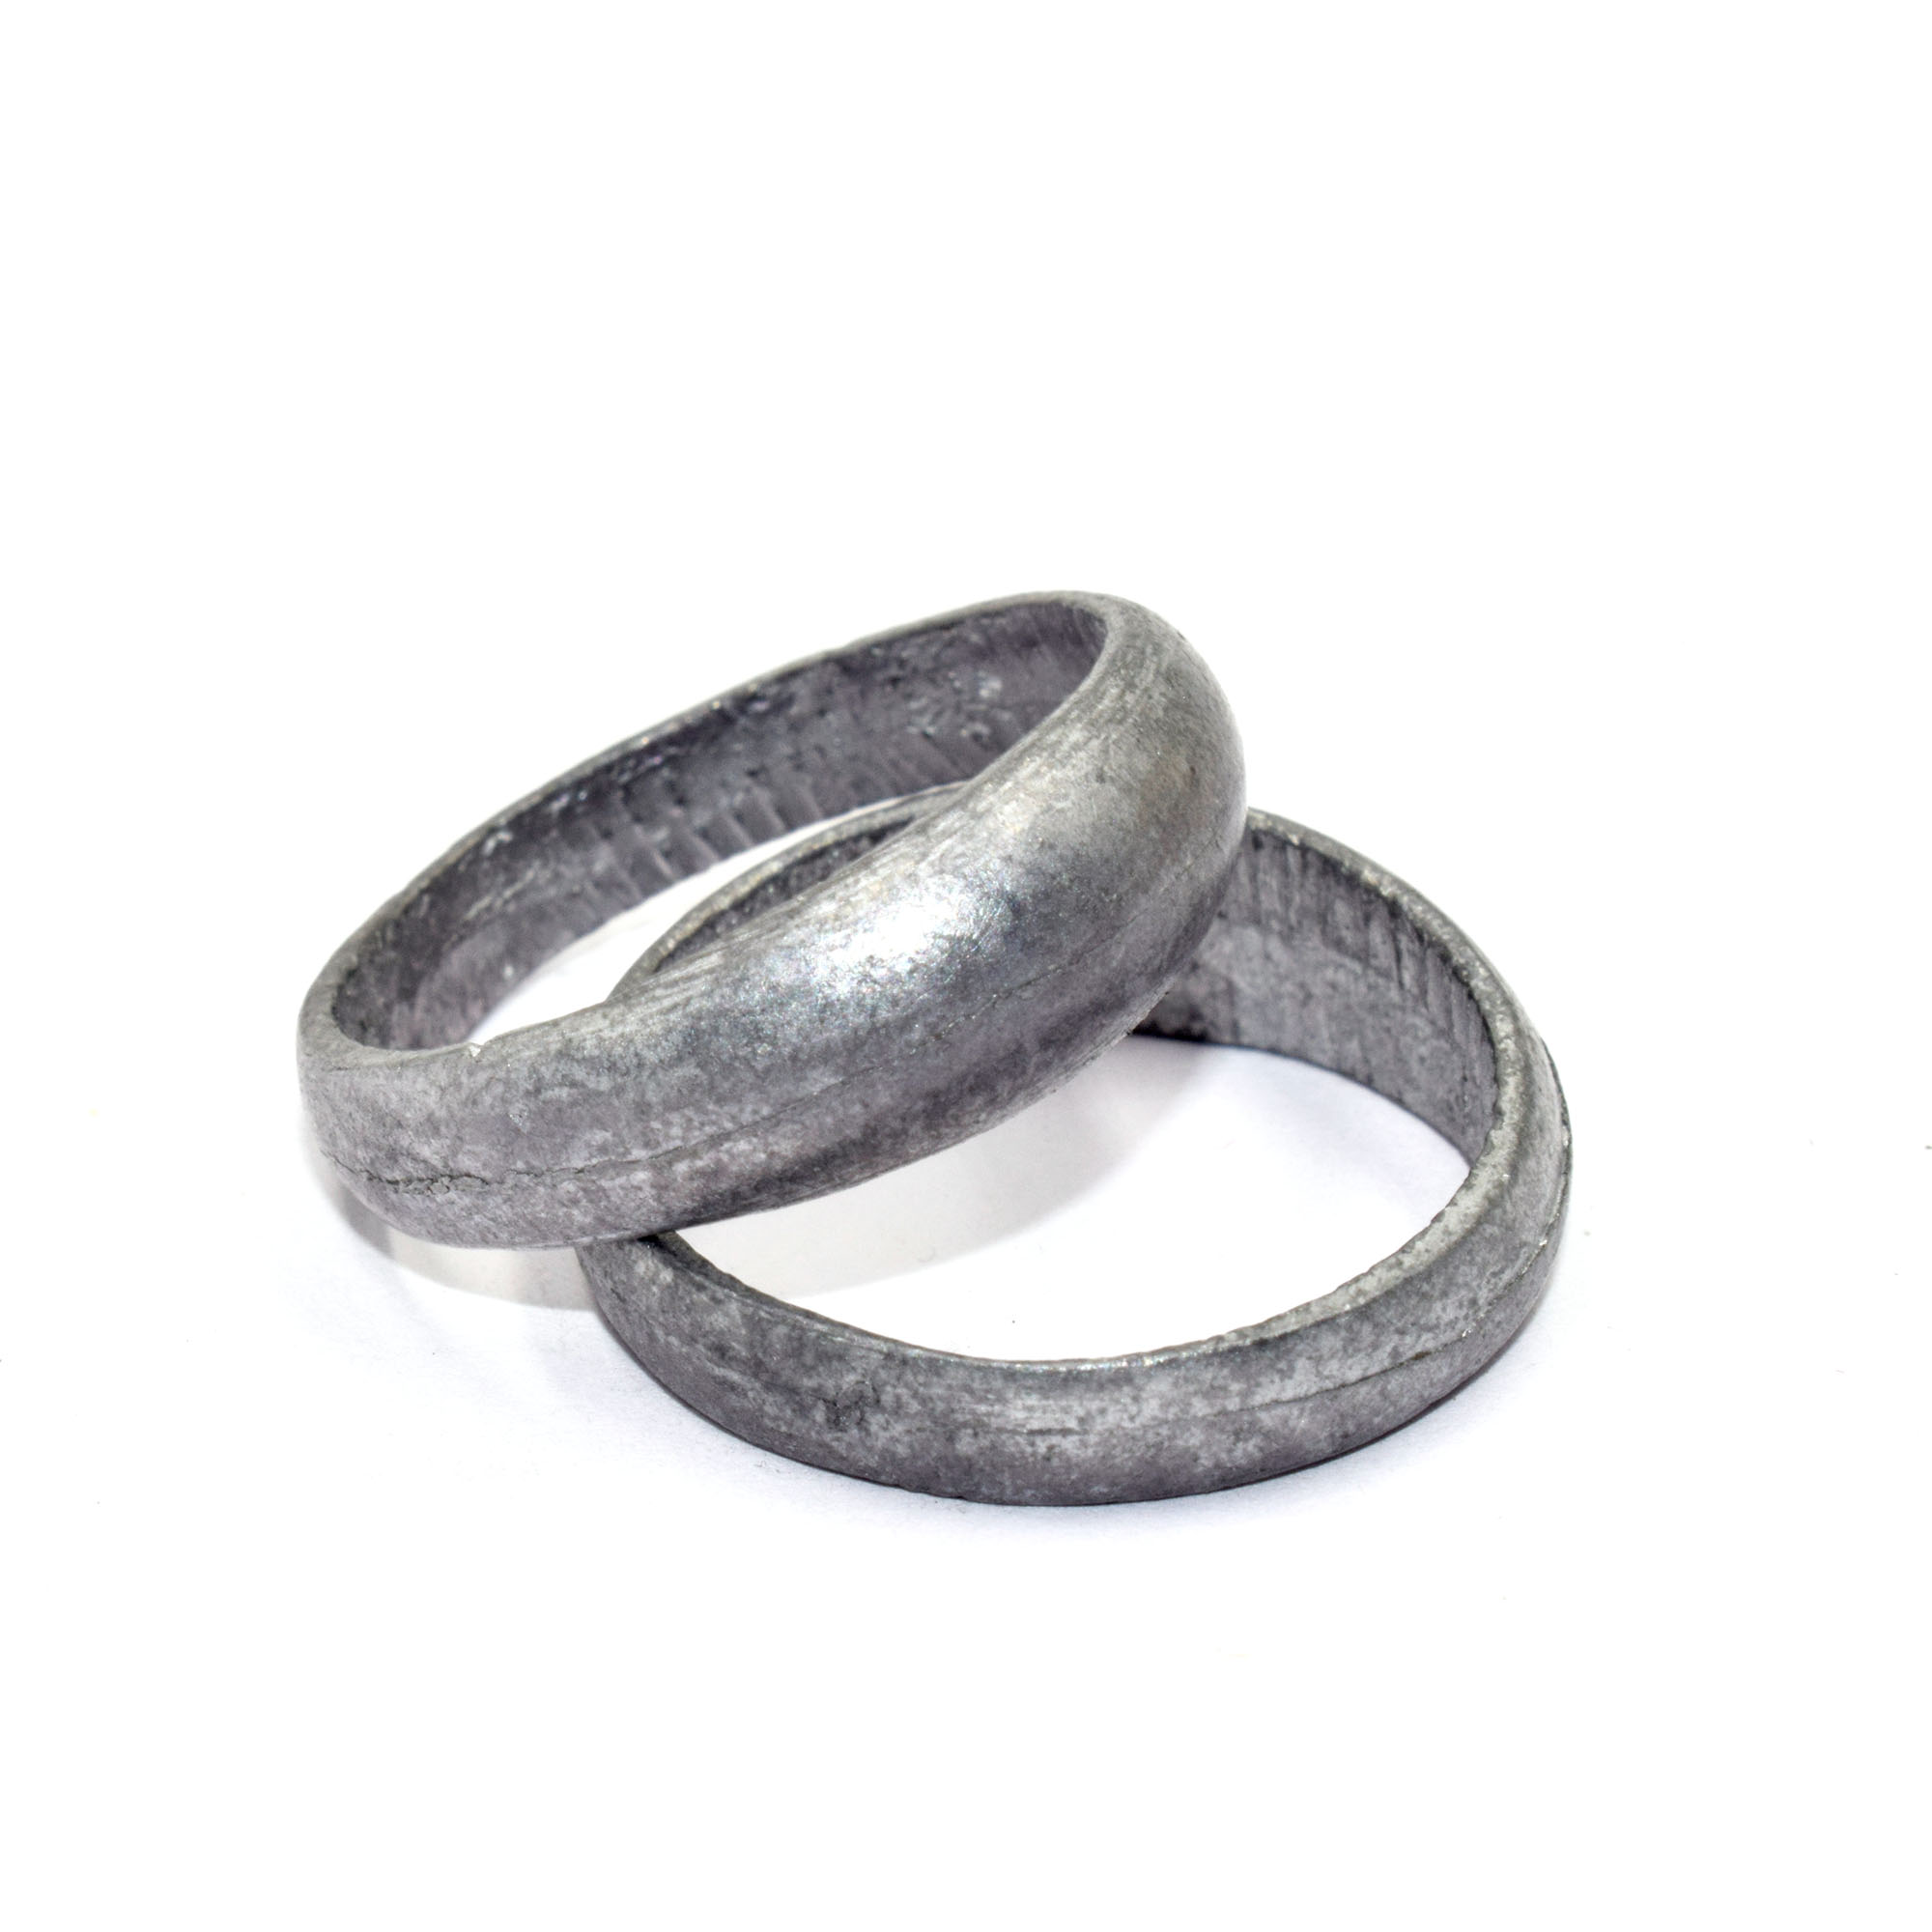 Buy Original Ranga Ring Online Combo Pack